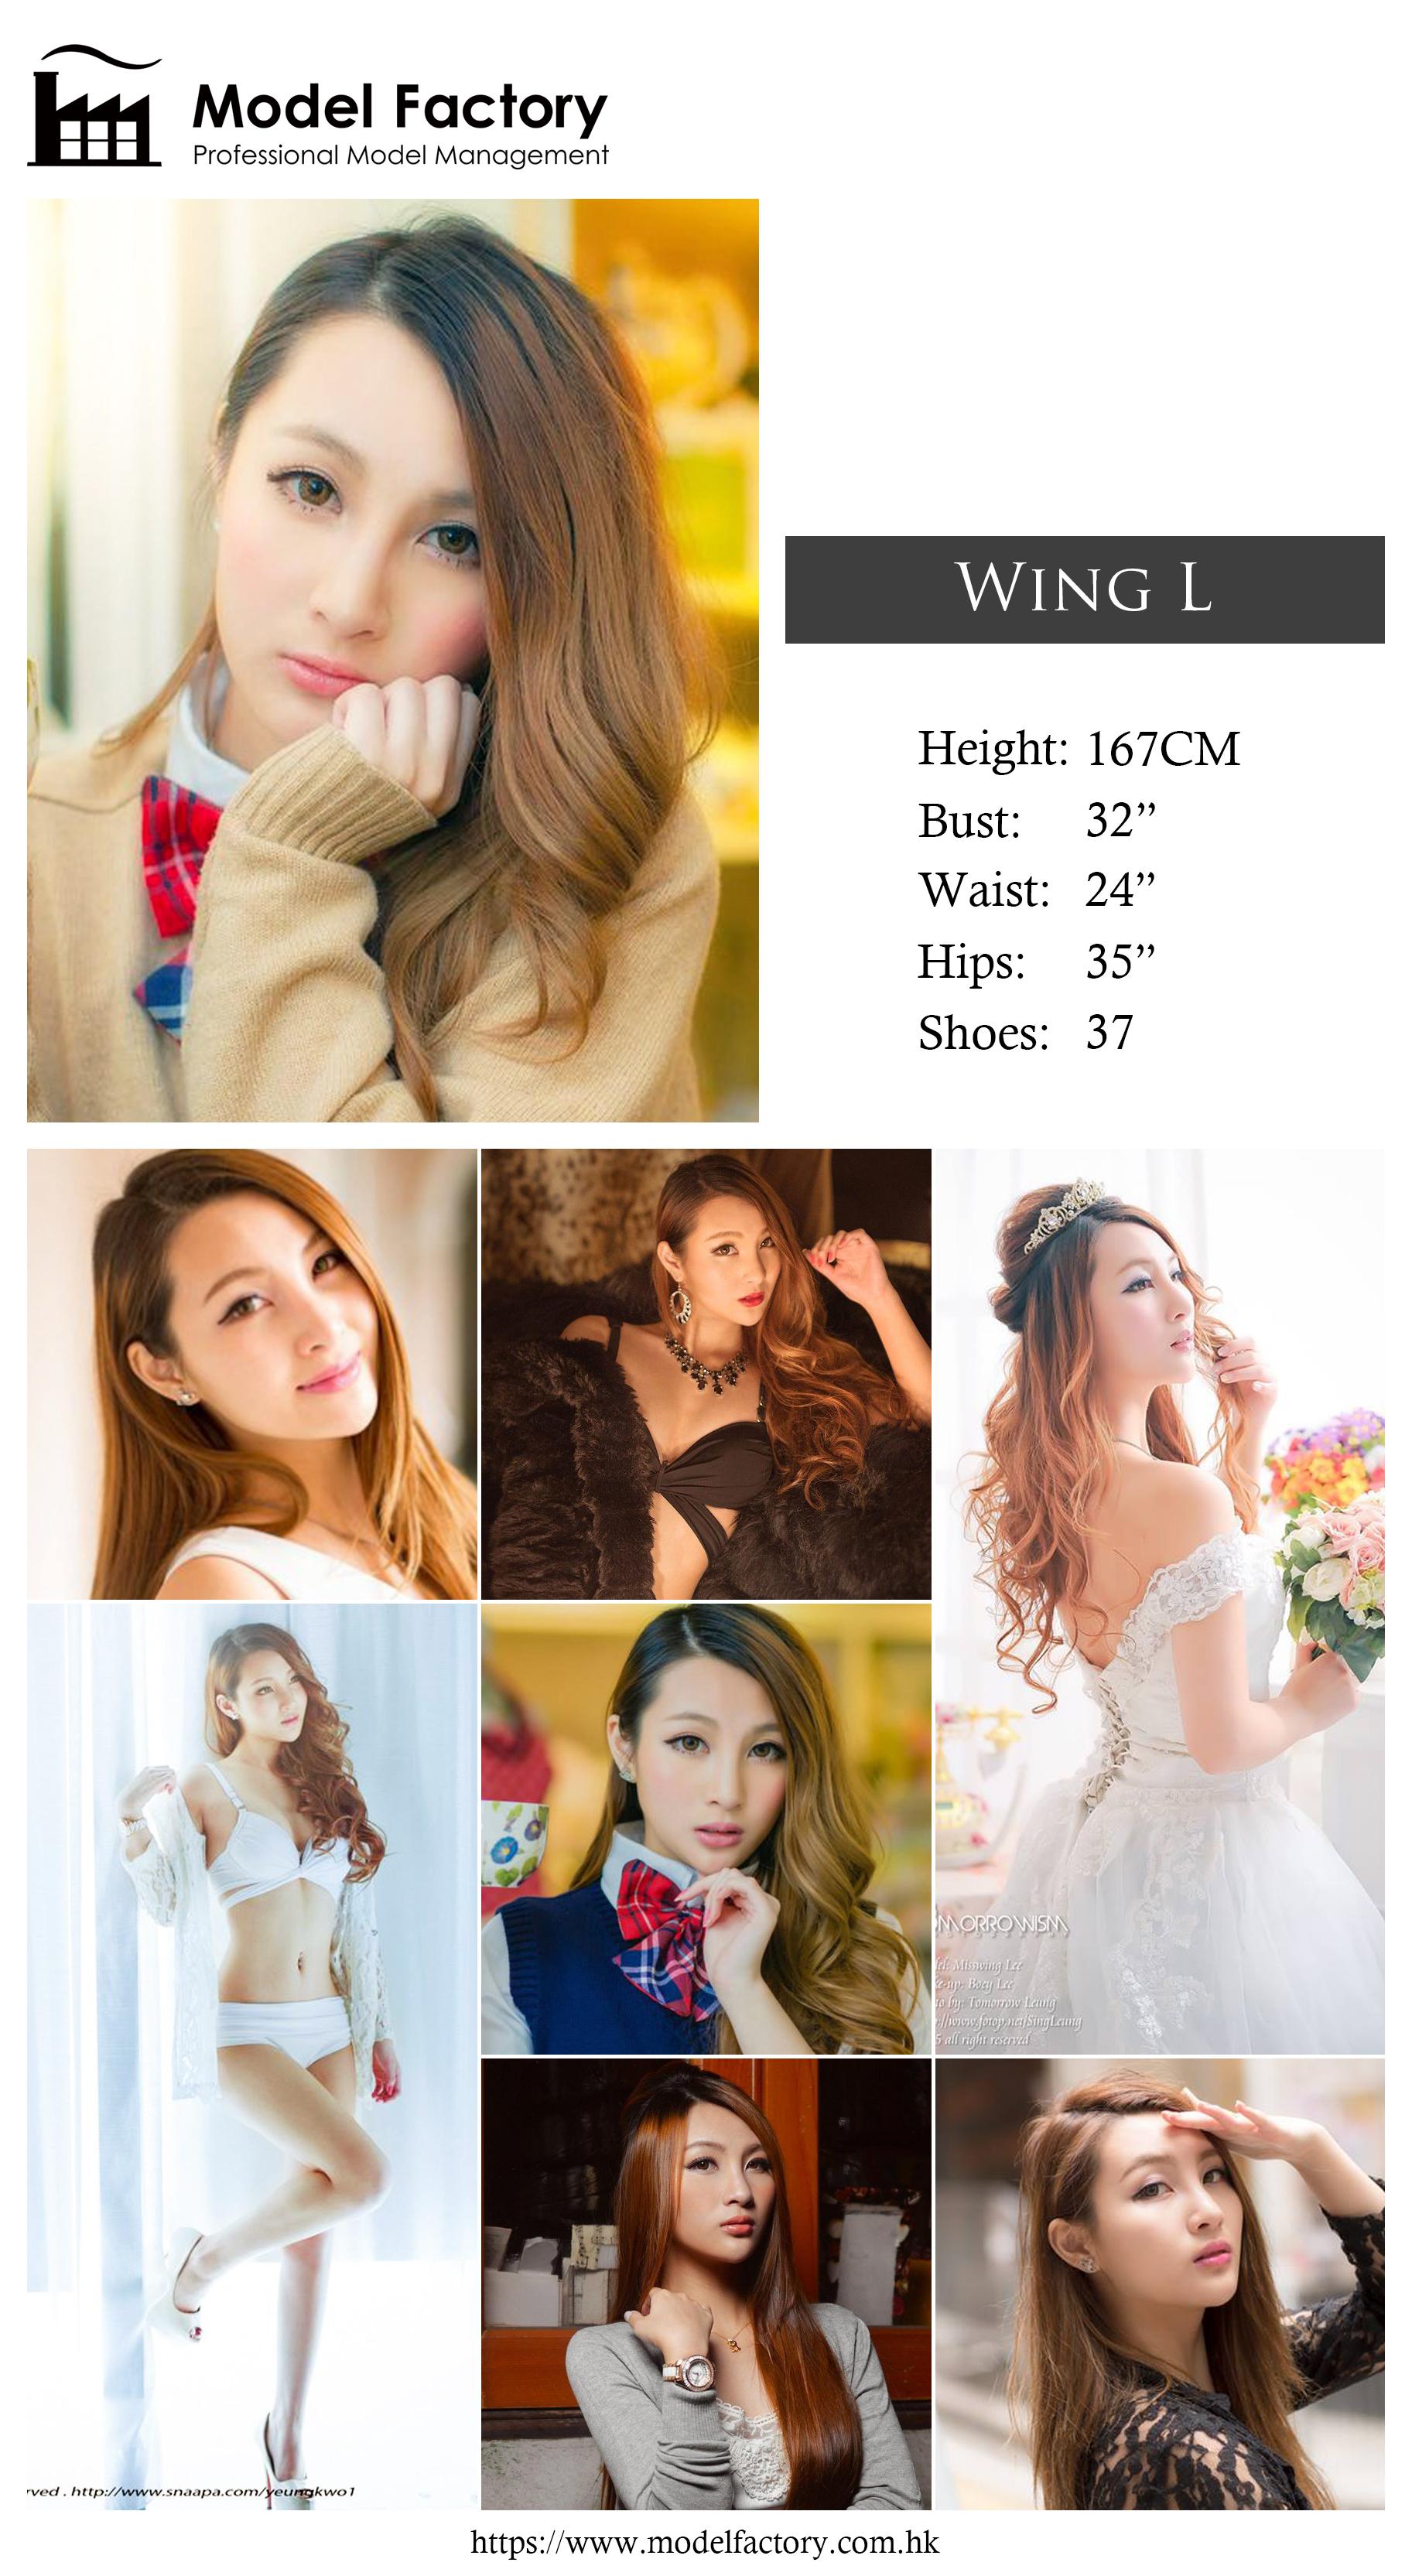 Model Factory Hong Kong Female Model WingL